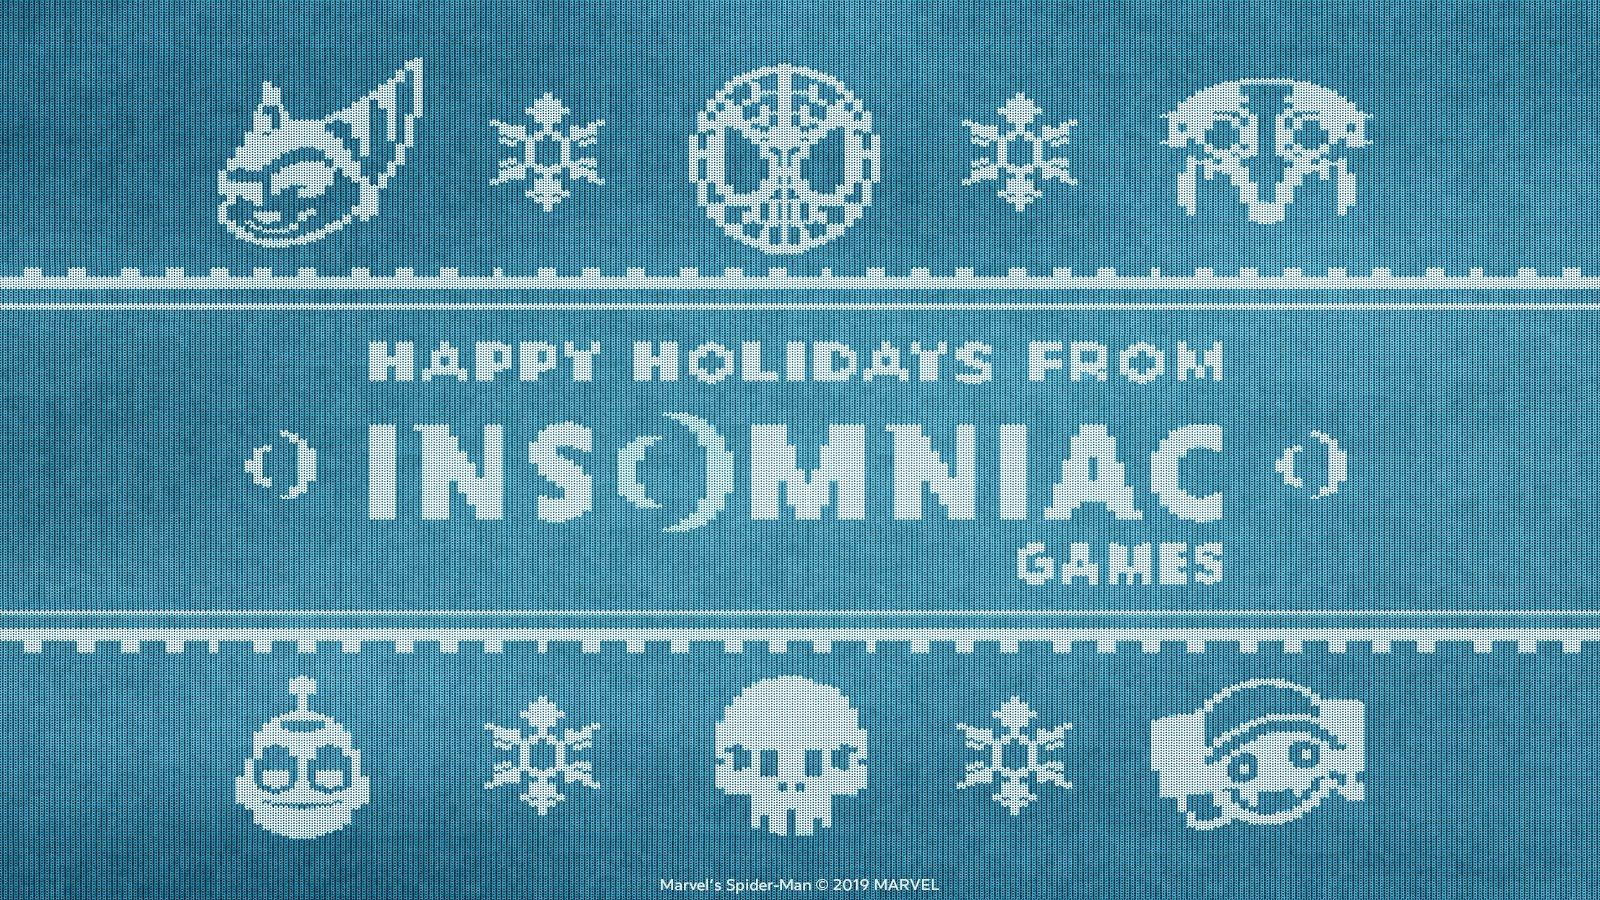 Insomniac Games Happy Holidays wallpaper